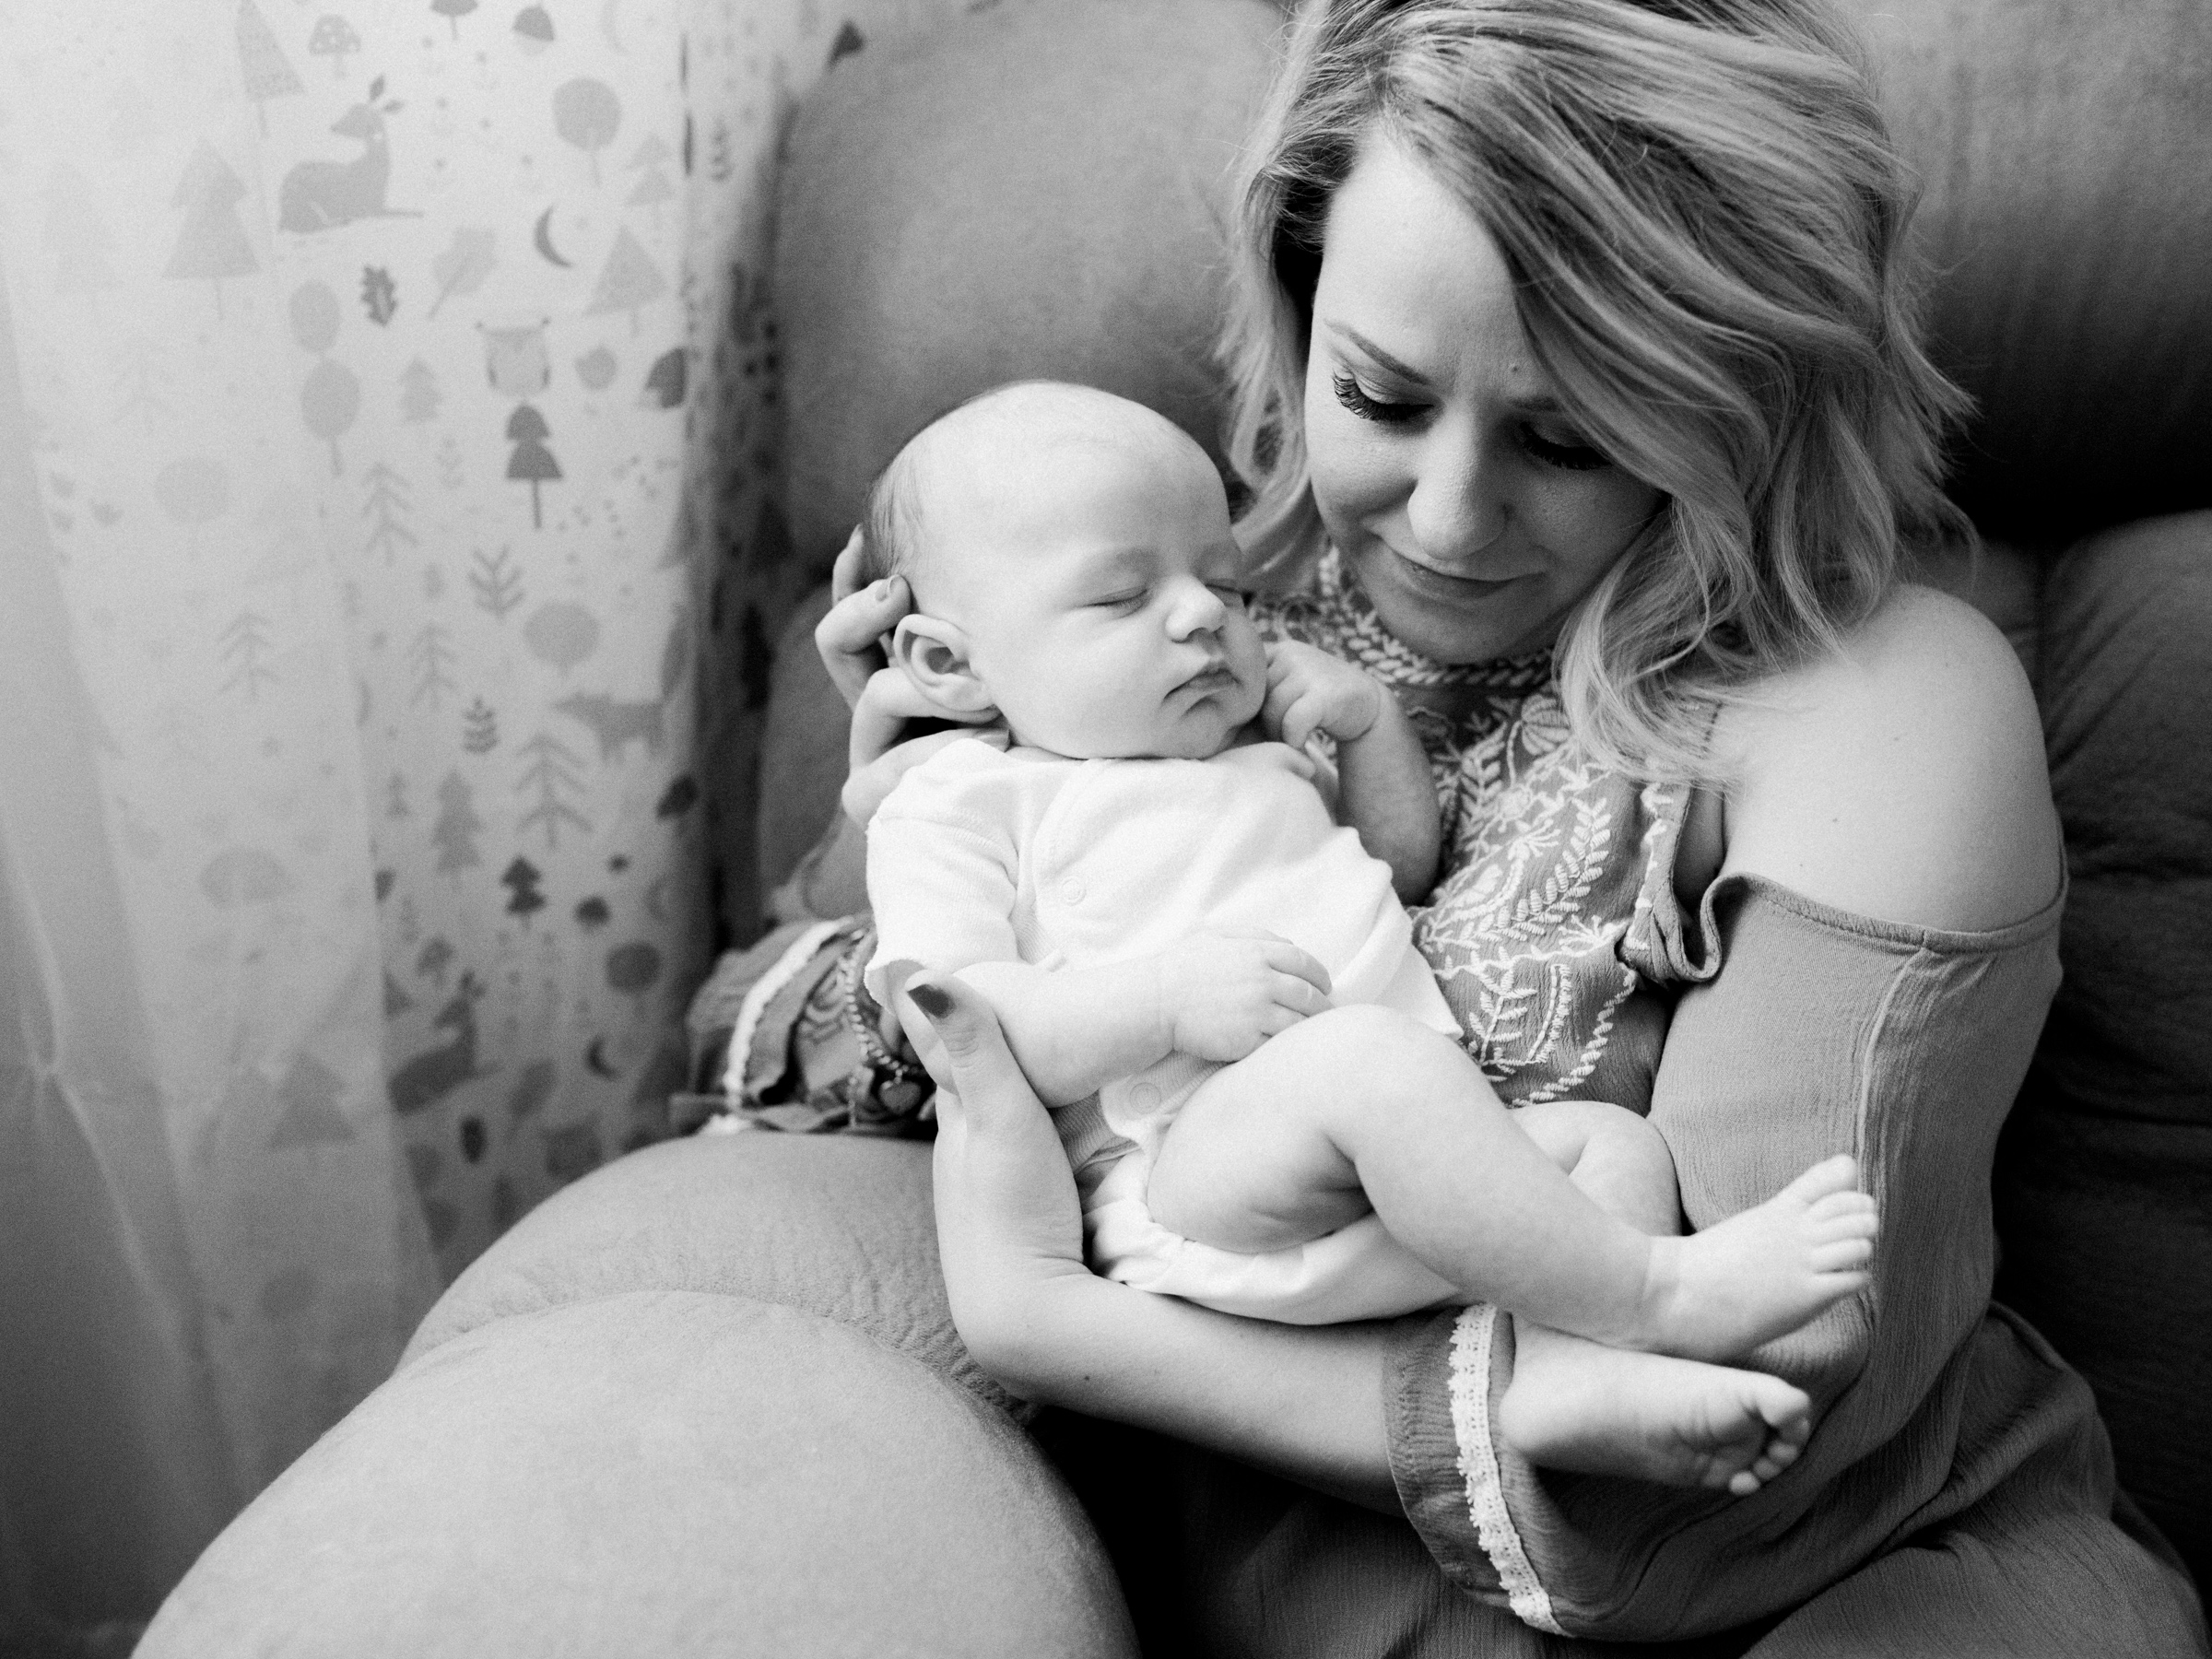 Jameson Boone   Newborn Lifestyle Session   Texas Portrait Photographer   Cute Baby Boy Nursery   Newborn Photos   Britni Dean Photography   britnidean.com